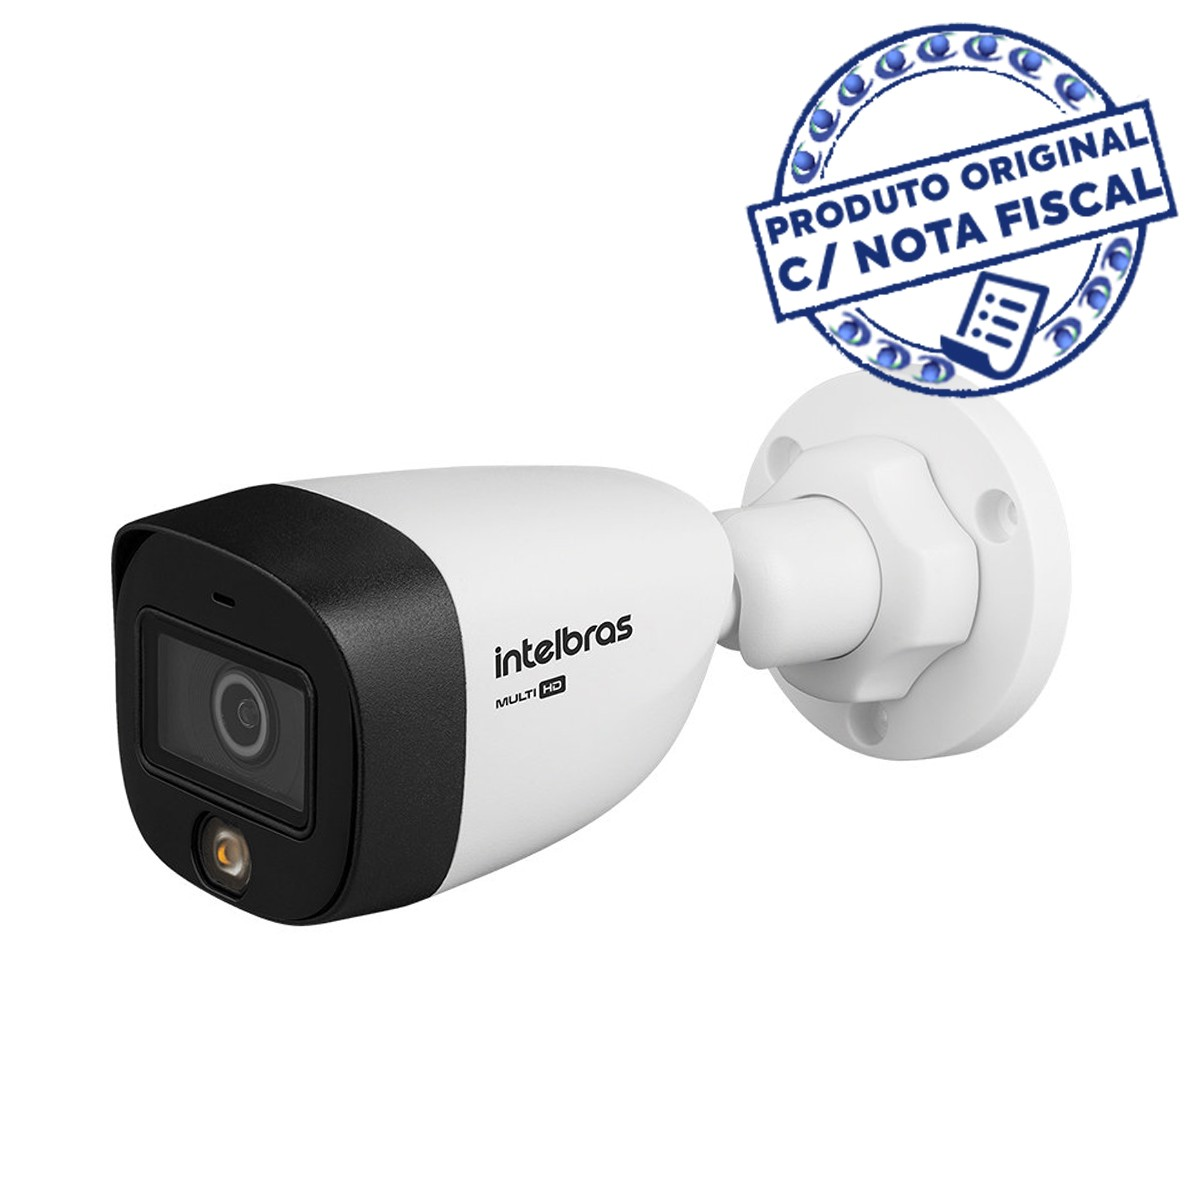 Câmera Intelbras Multi HD® VHD 1220 B Full Color 1080p Lente 3.6mm